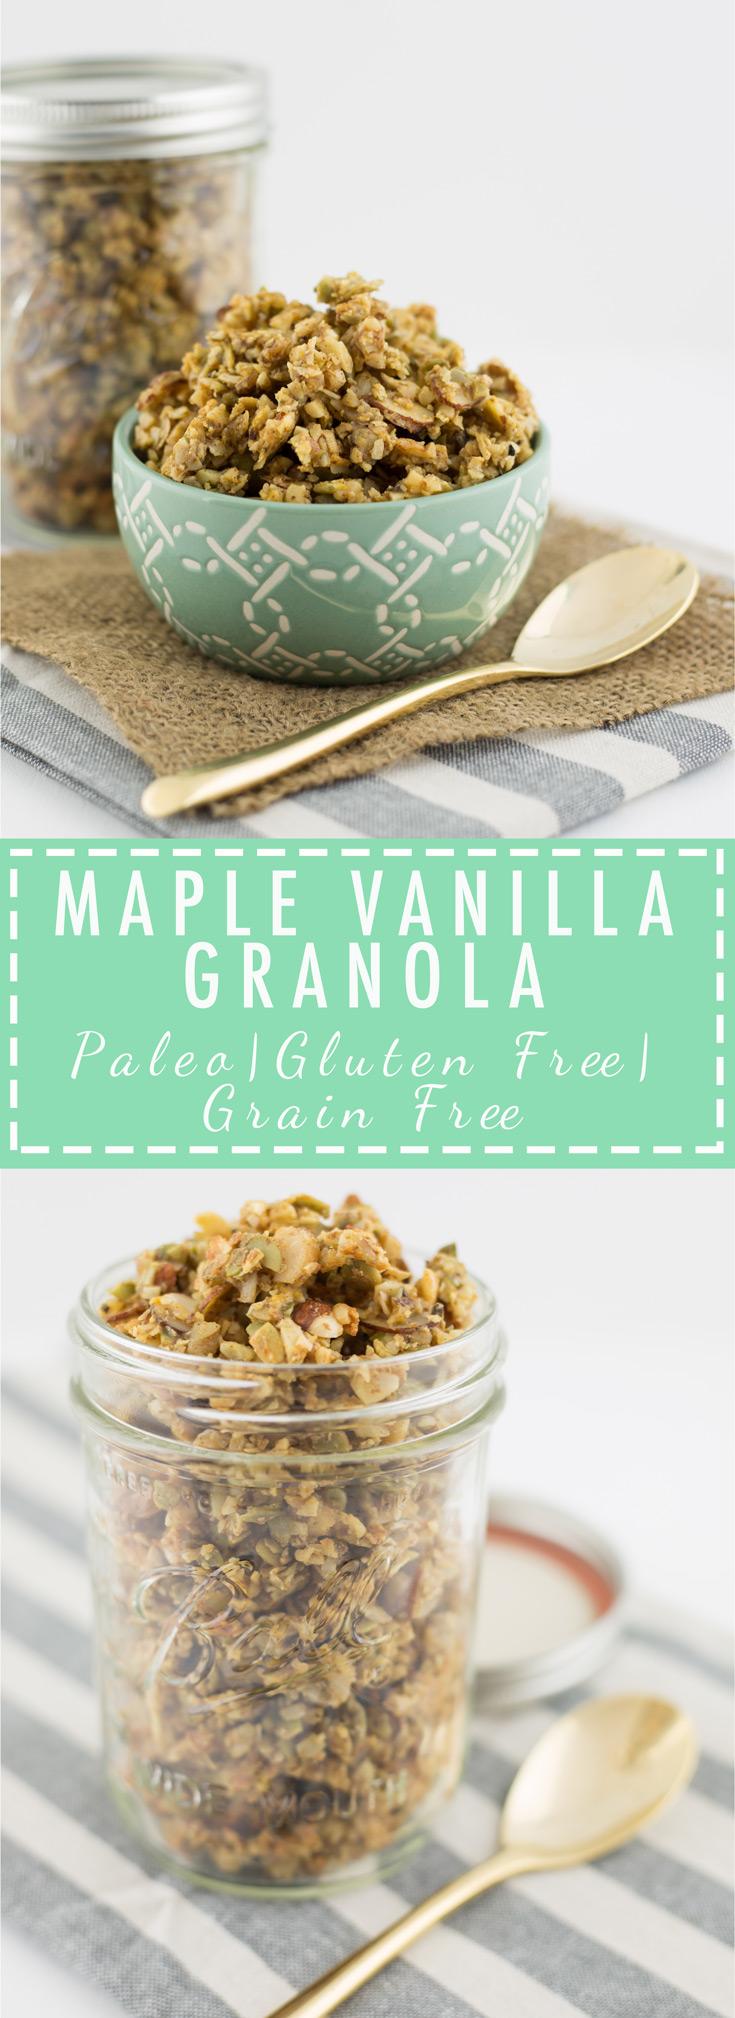 Maple vanilla granola, paleo, primal, gluten free, grain free, dairy free, homemade granola recipe, healthy foods